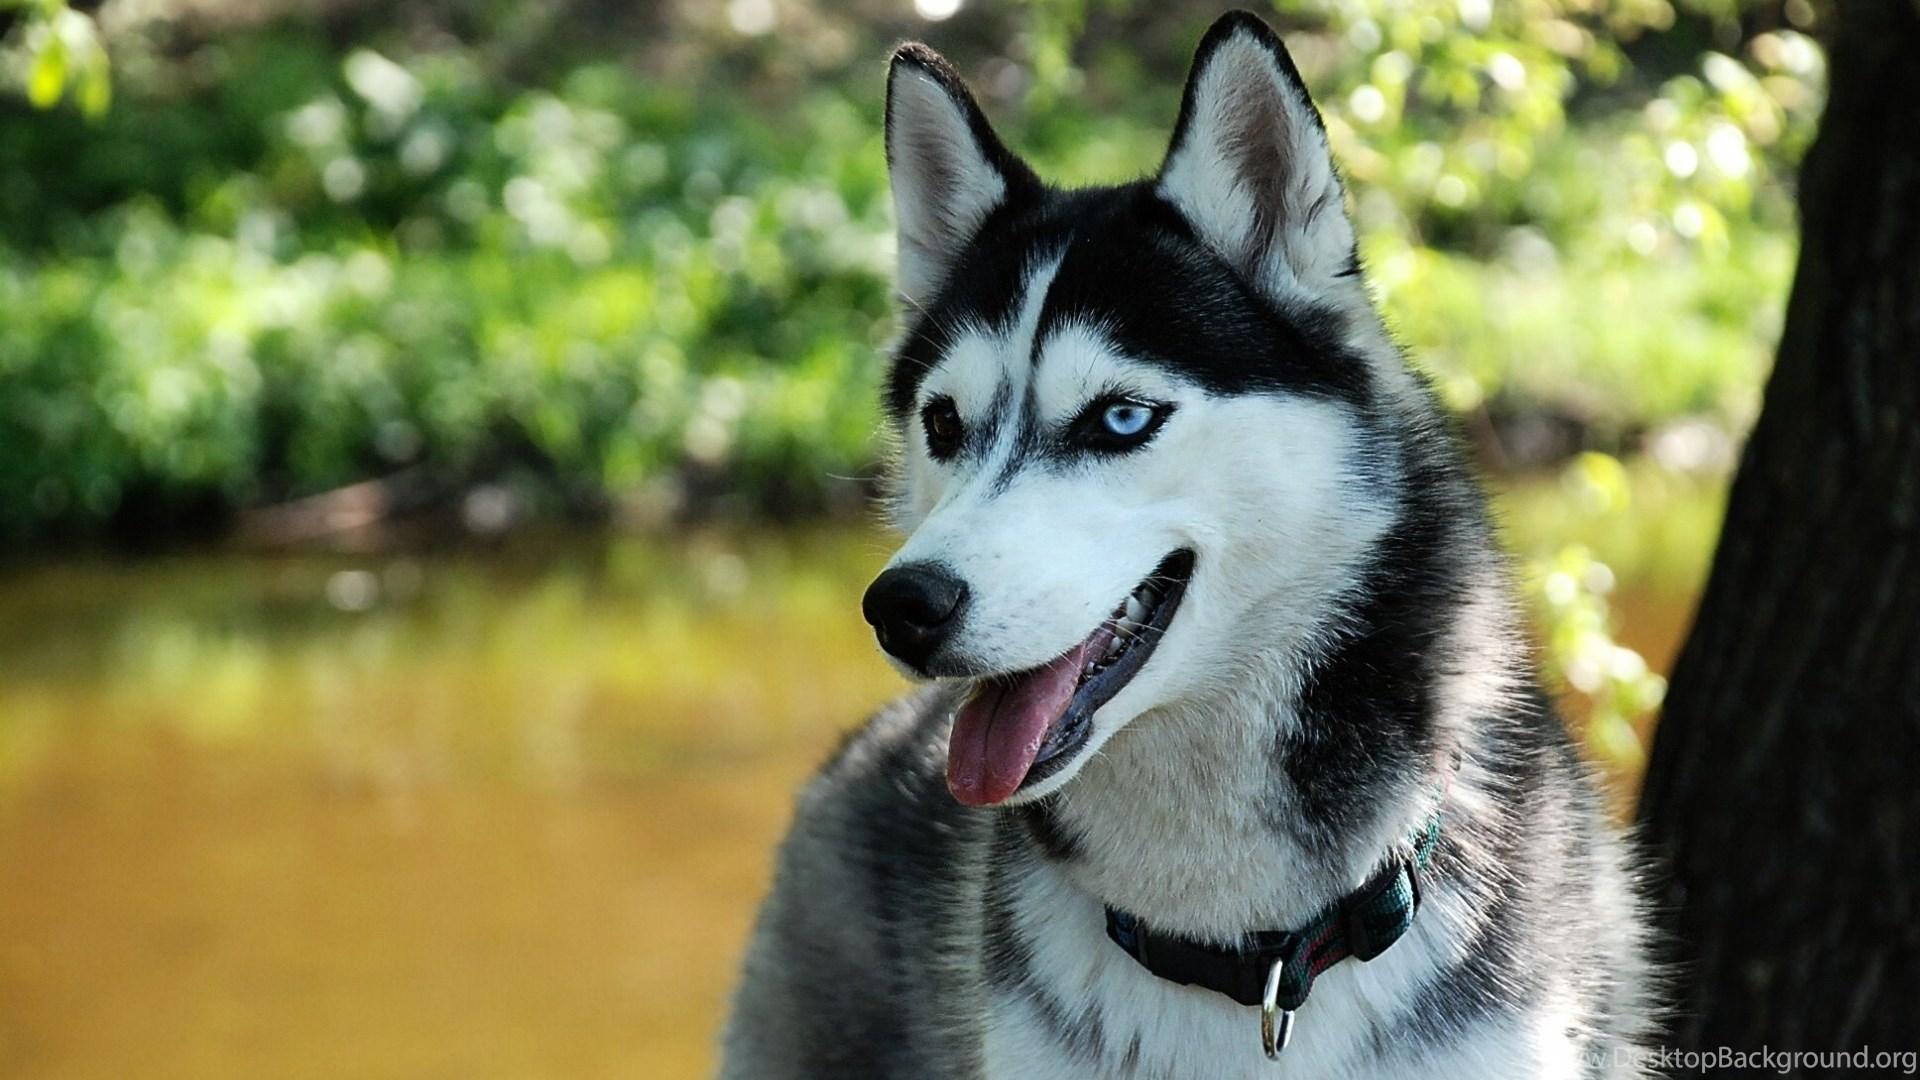 Siberian Husky Dogs Wallpapers 2356 1920x1200 Umad Com Desktop